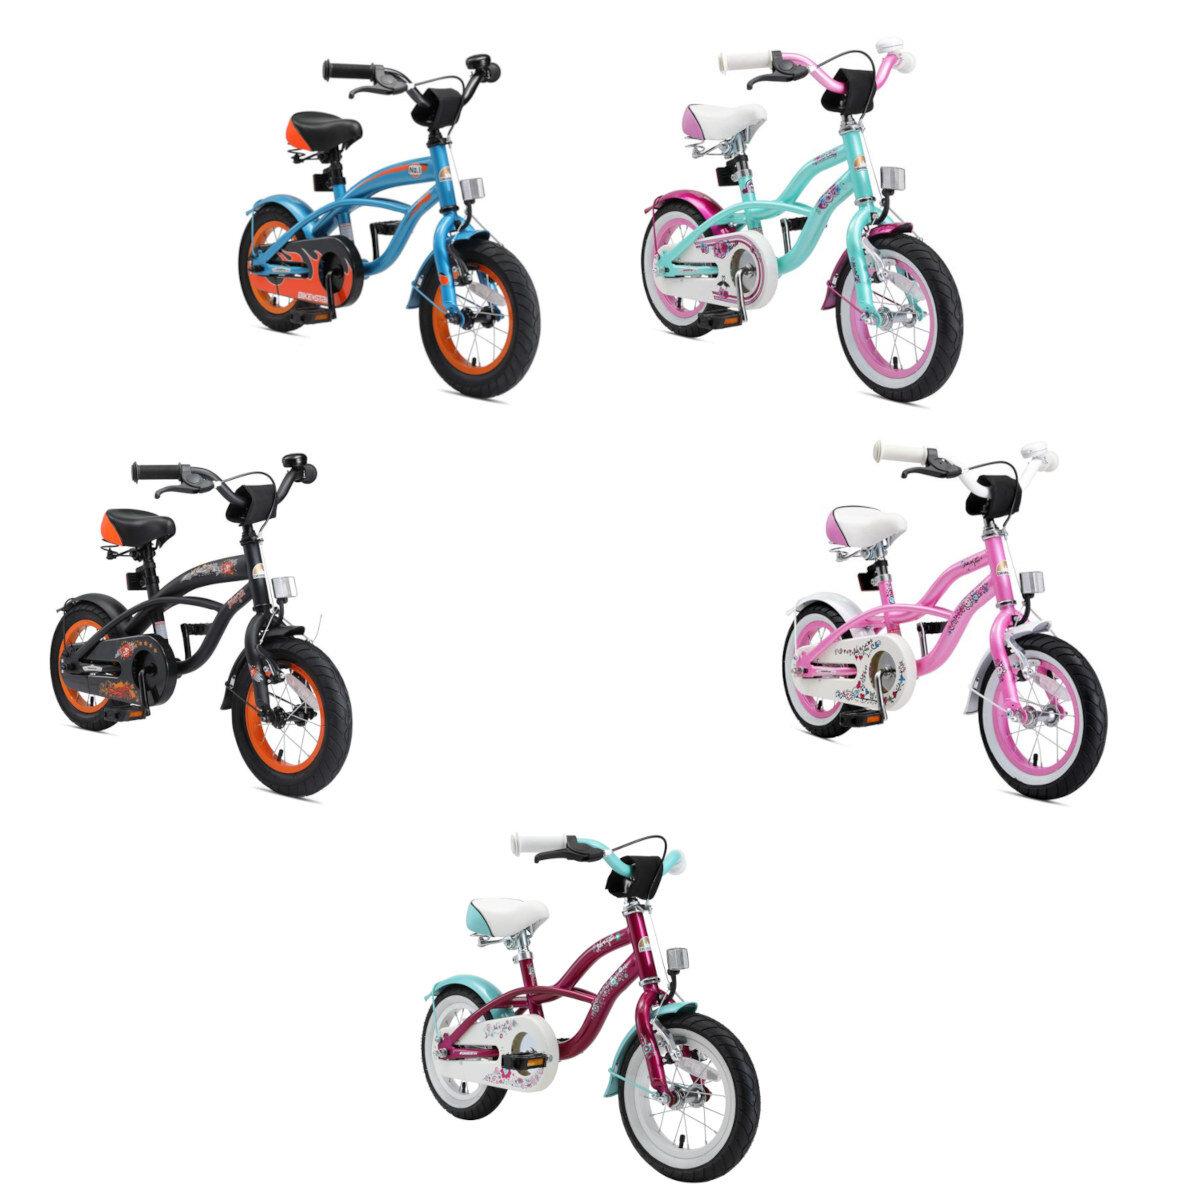 Star Trademarks Kinderfahrrad Bikestar 12 Zoll - Deluxe Cruiser